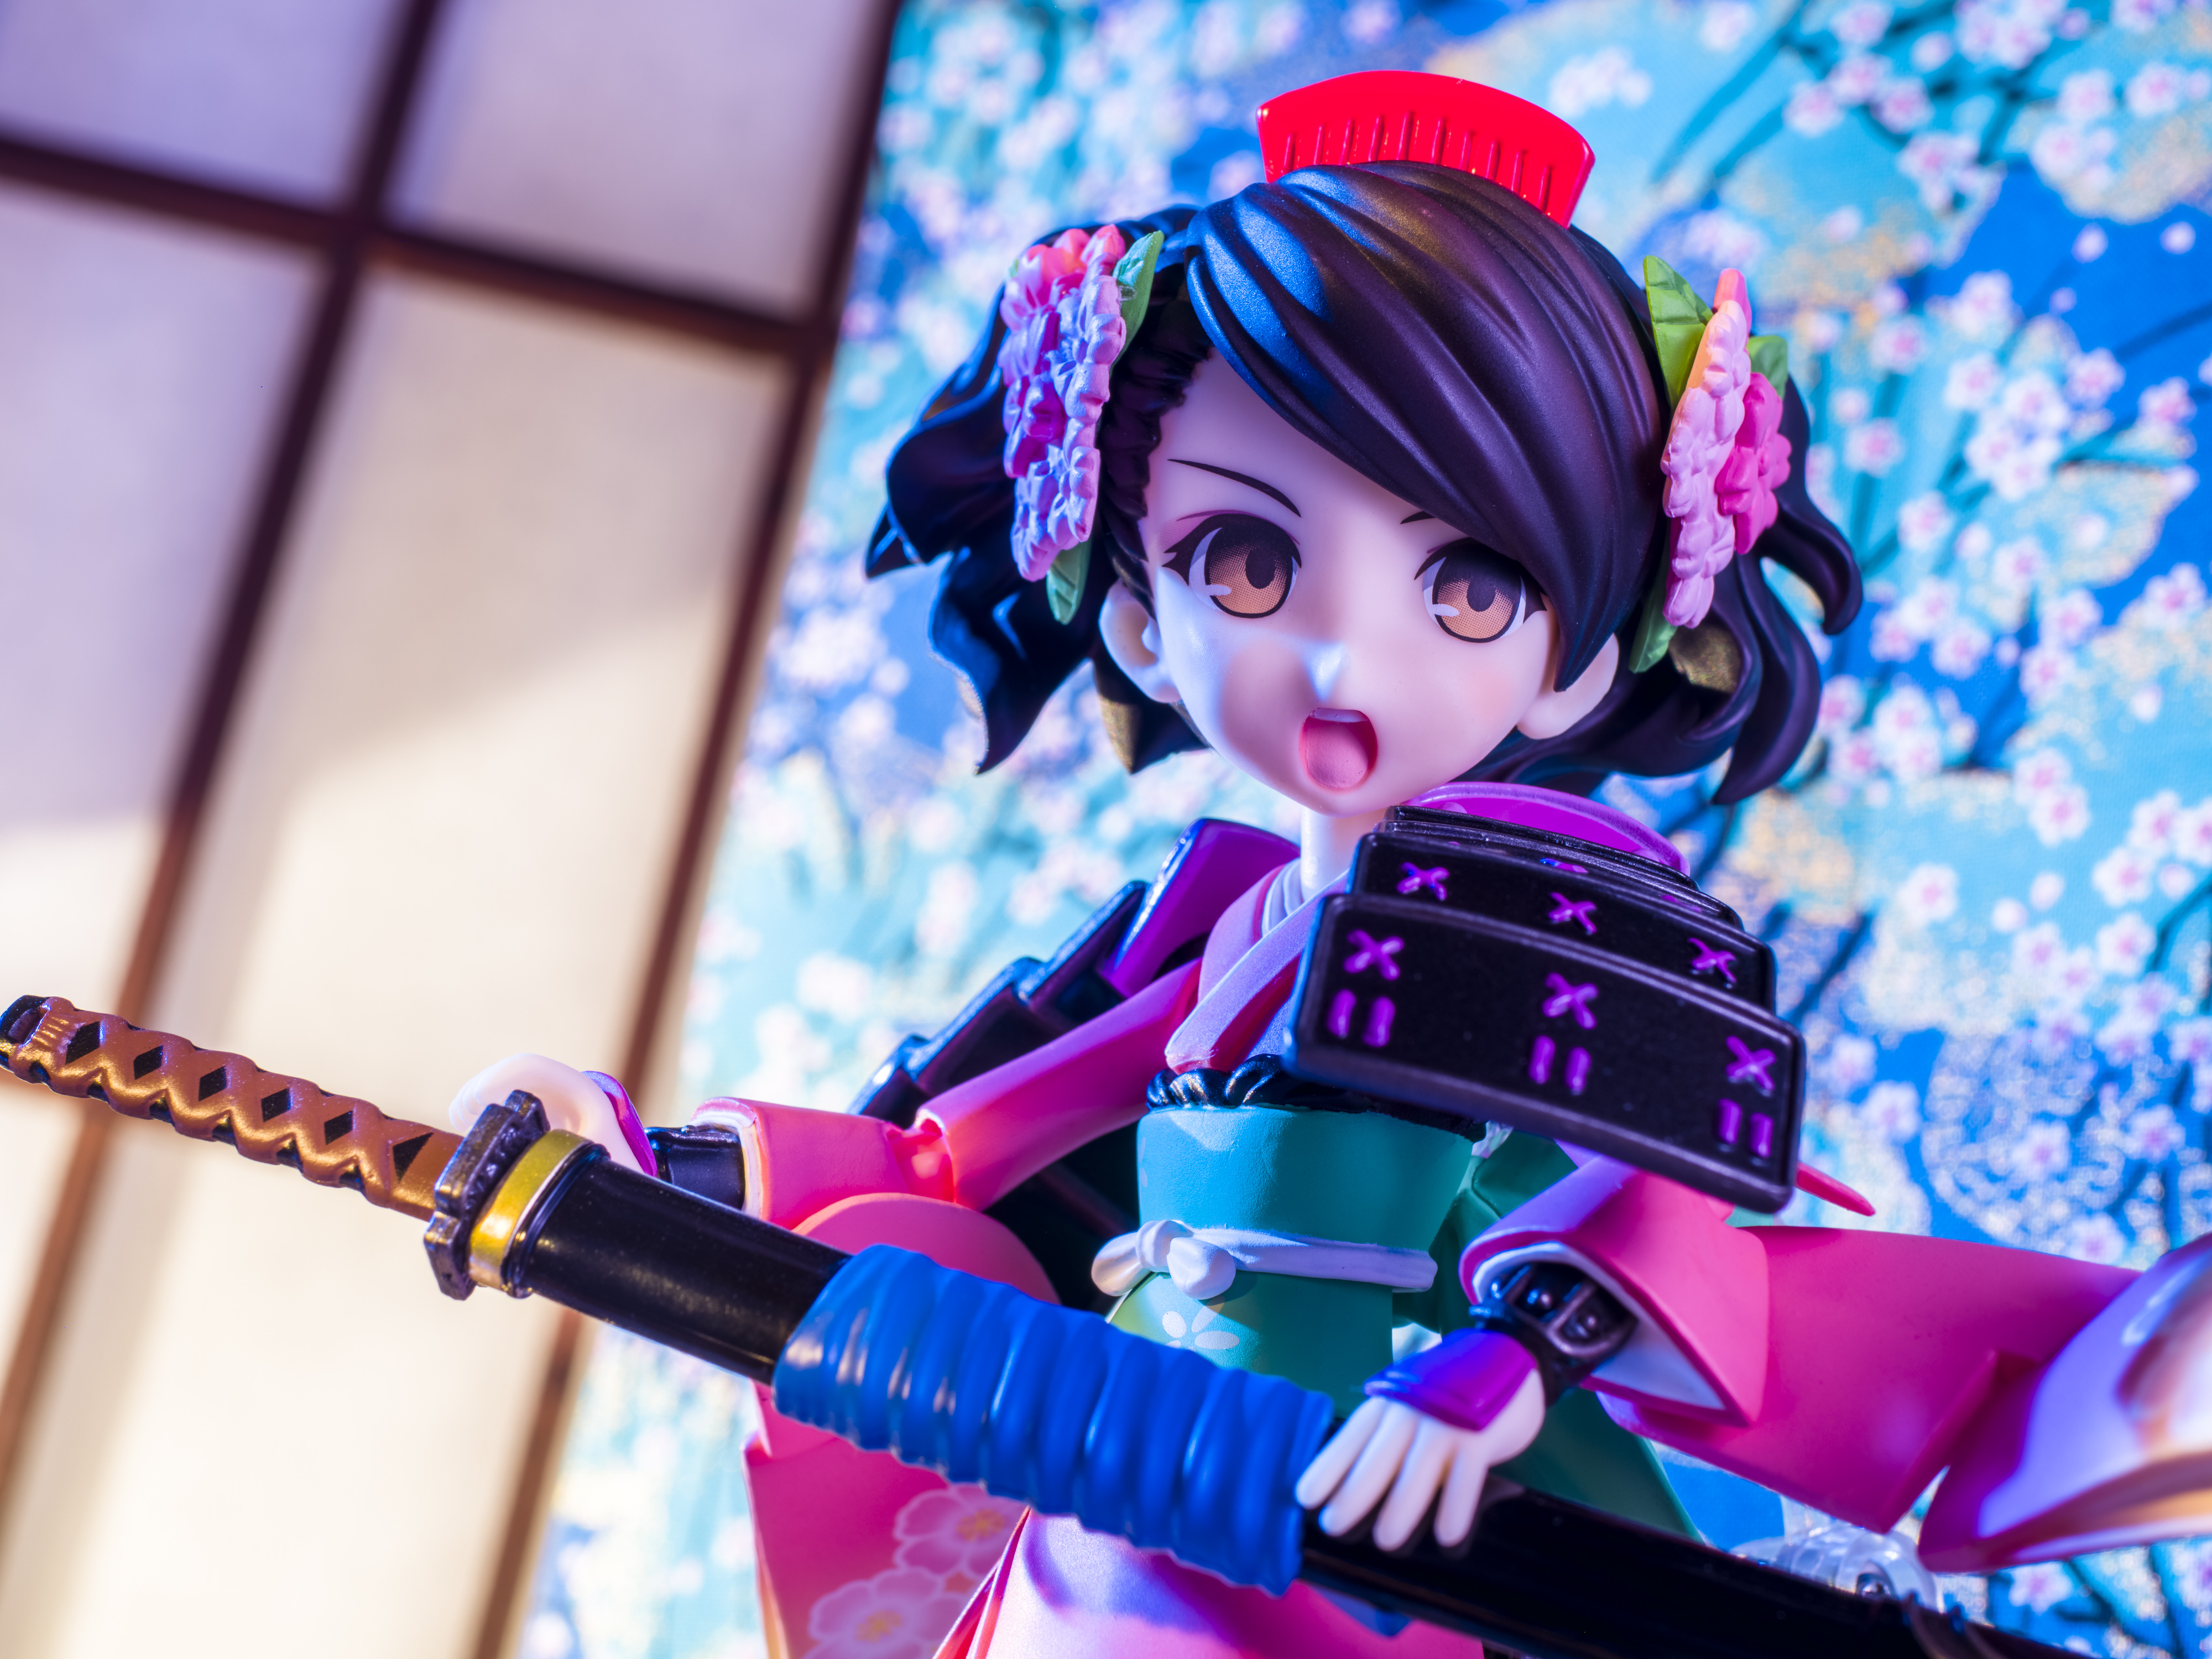 momohime oboro_muramasa phat_company toona_kanshi parfom scratch_modelist marvelous_inc.